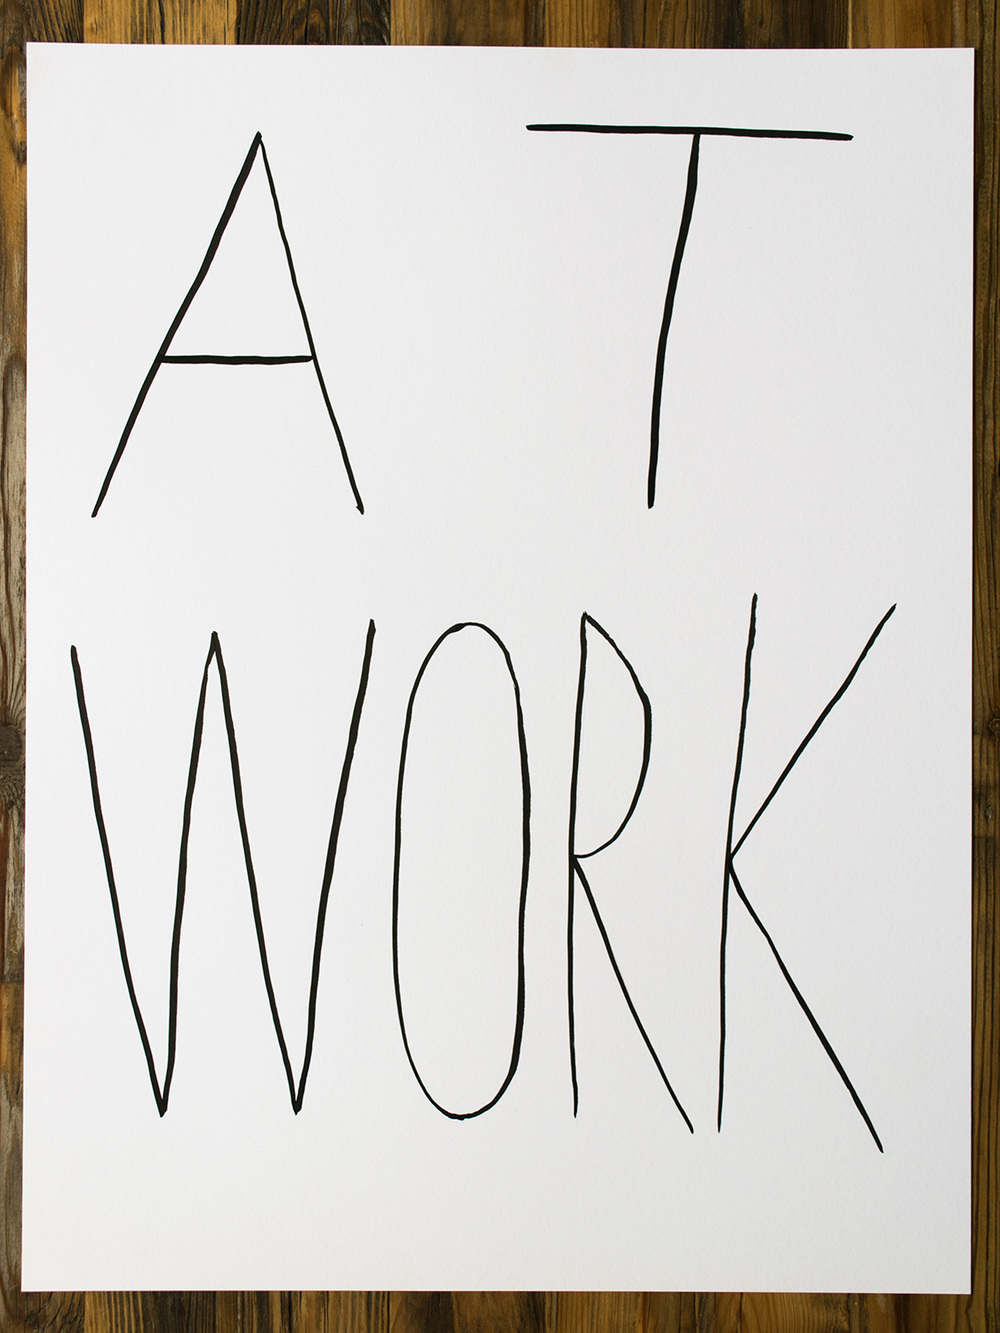 at_work-1500x1125.jpg